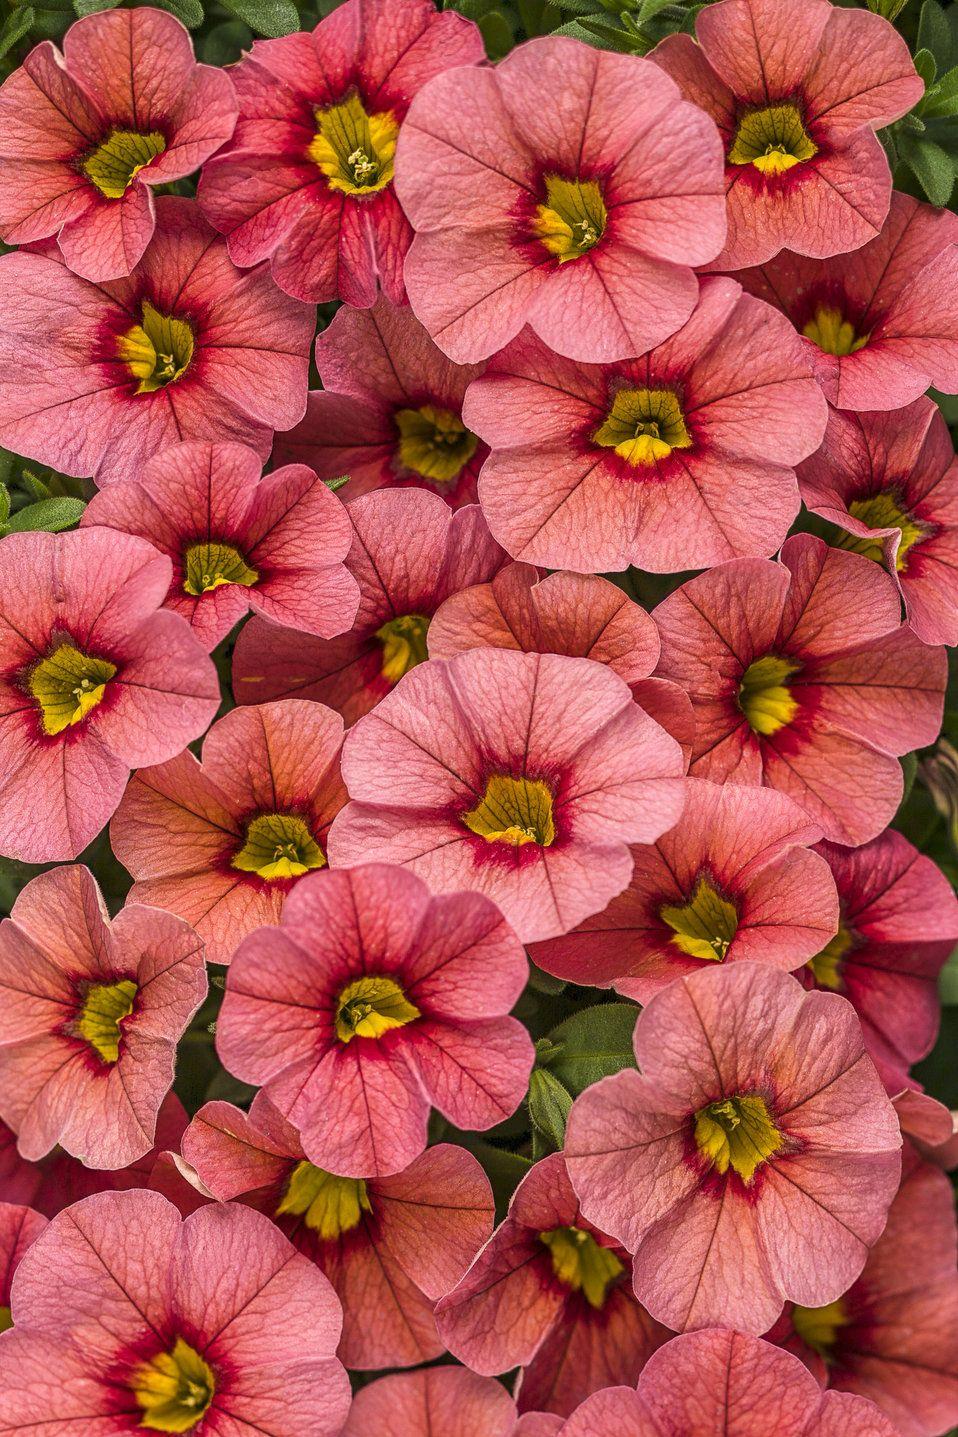 Superbells® Coralina Calibrachoa hybrid (With images